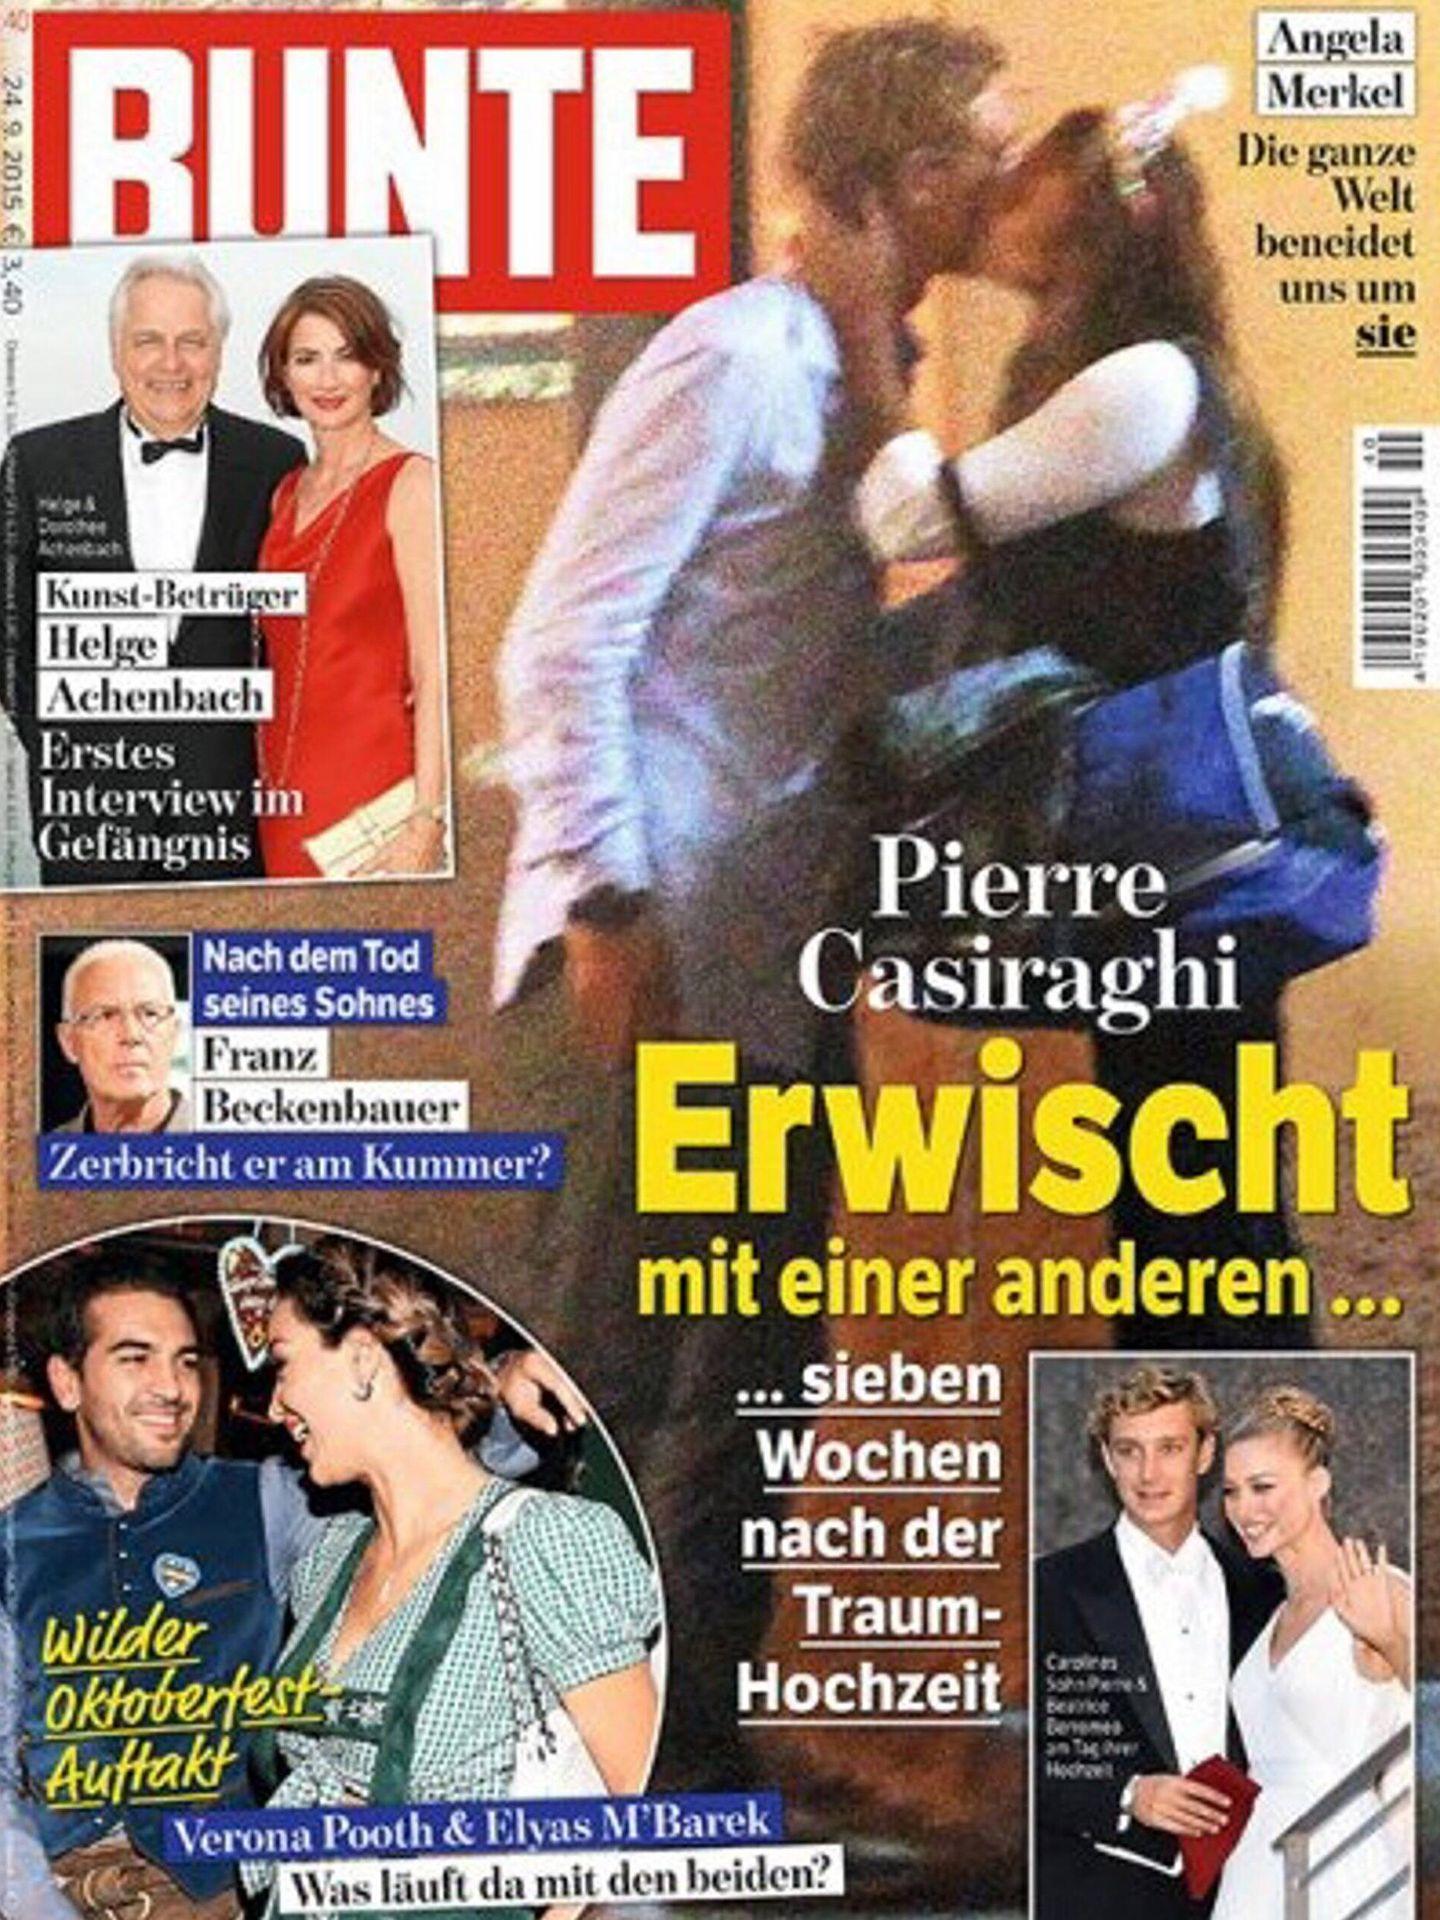 La portada de Pierre Casiraghi.